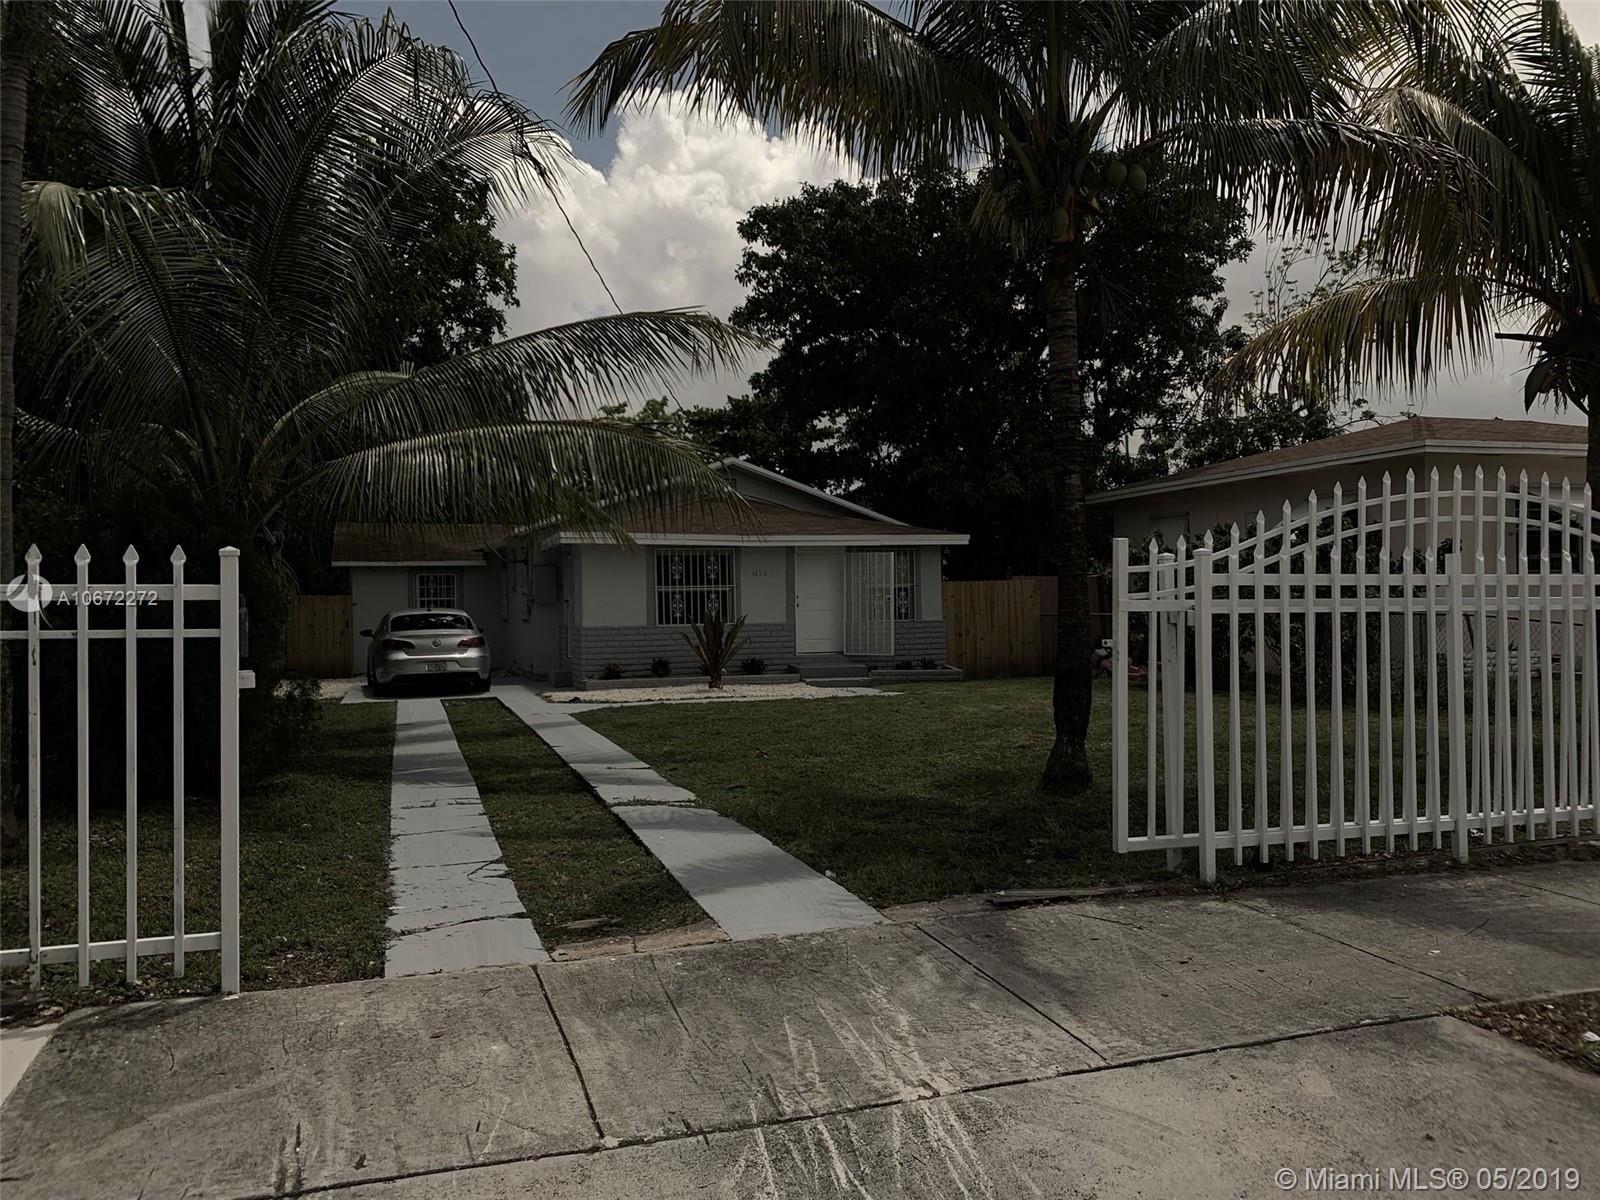 Photo of 1470 NW 41st St, Miami, FL 33142 (MLS # A10672272)